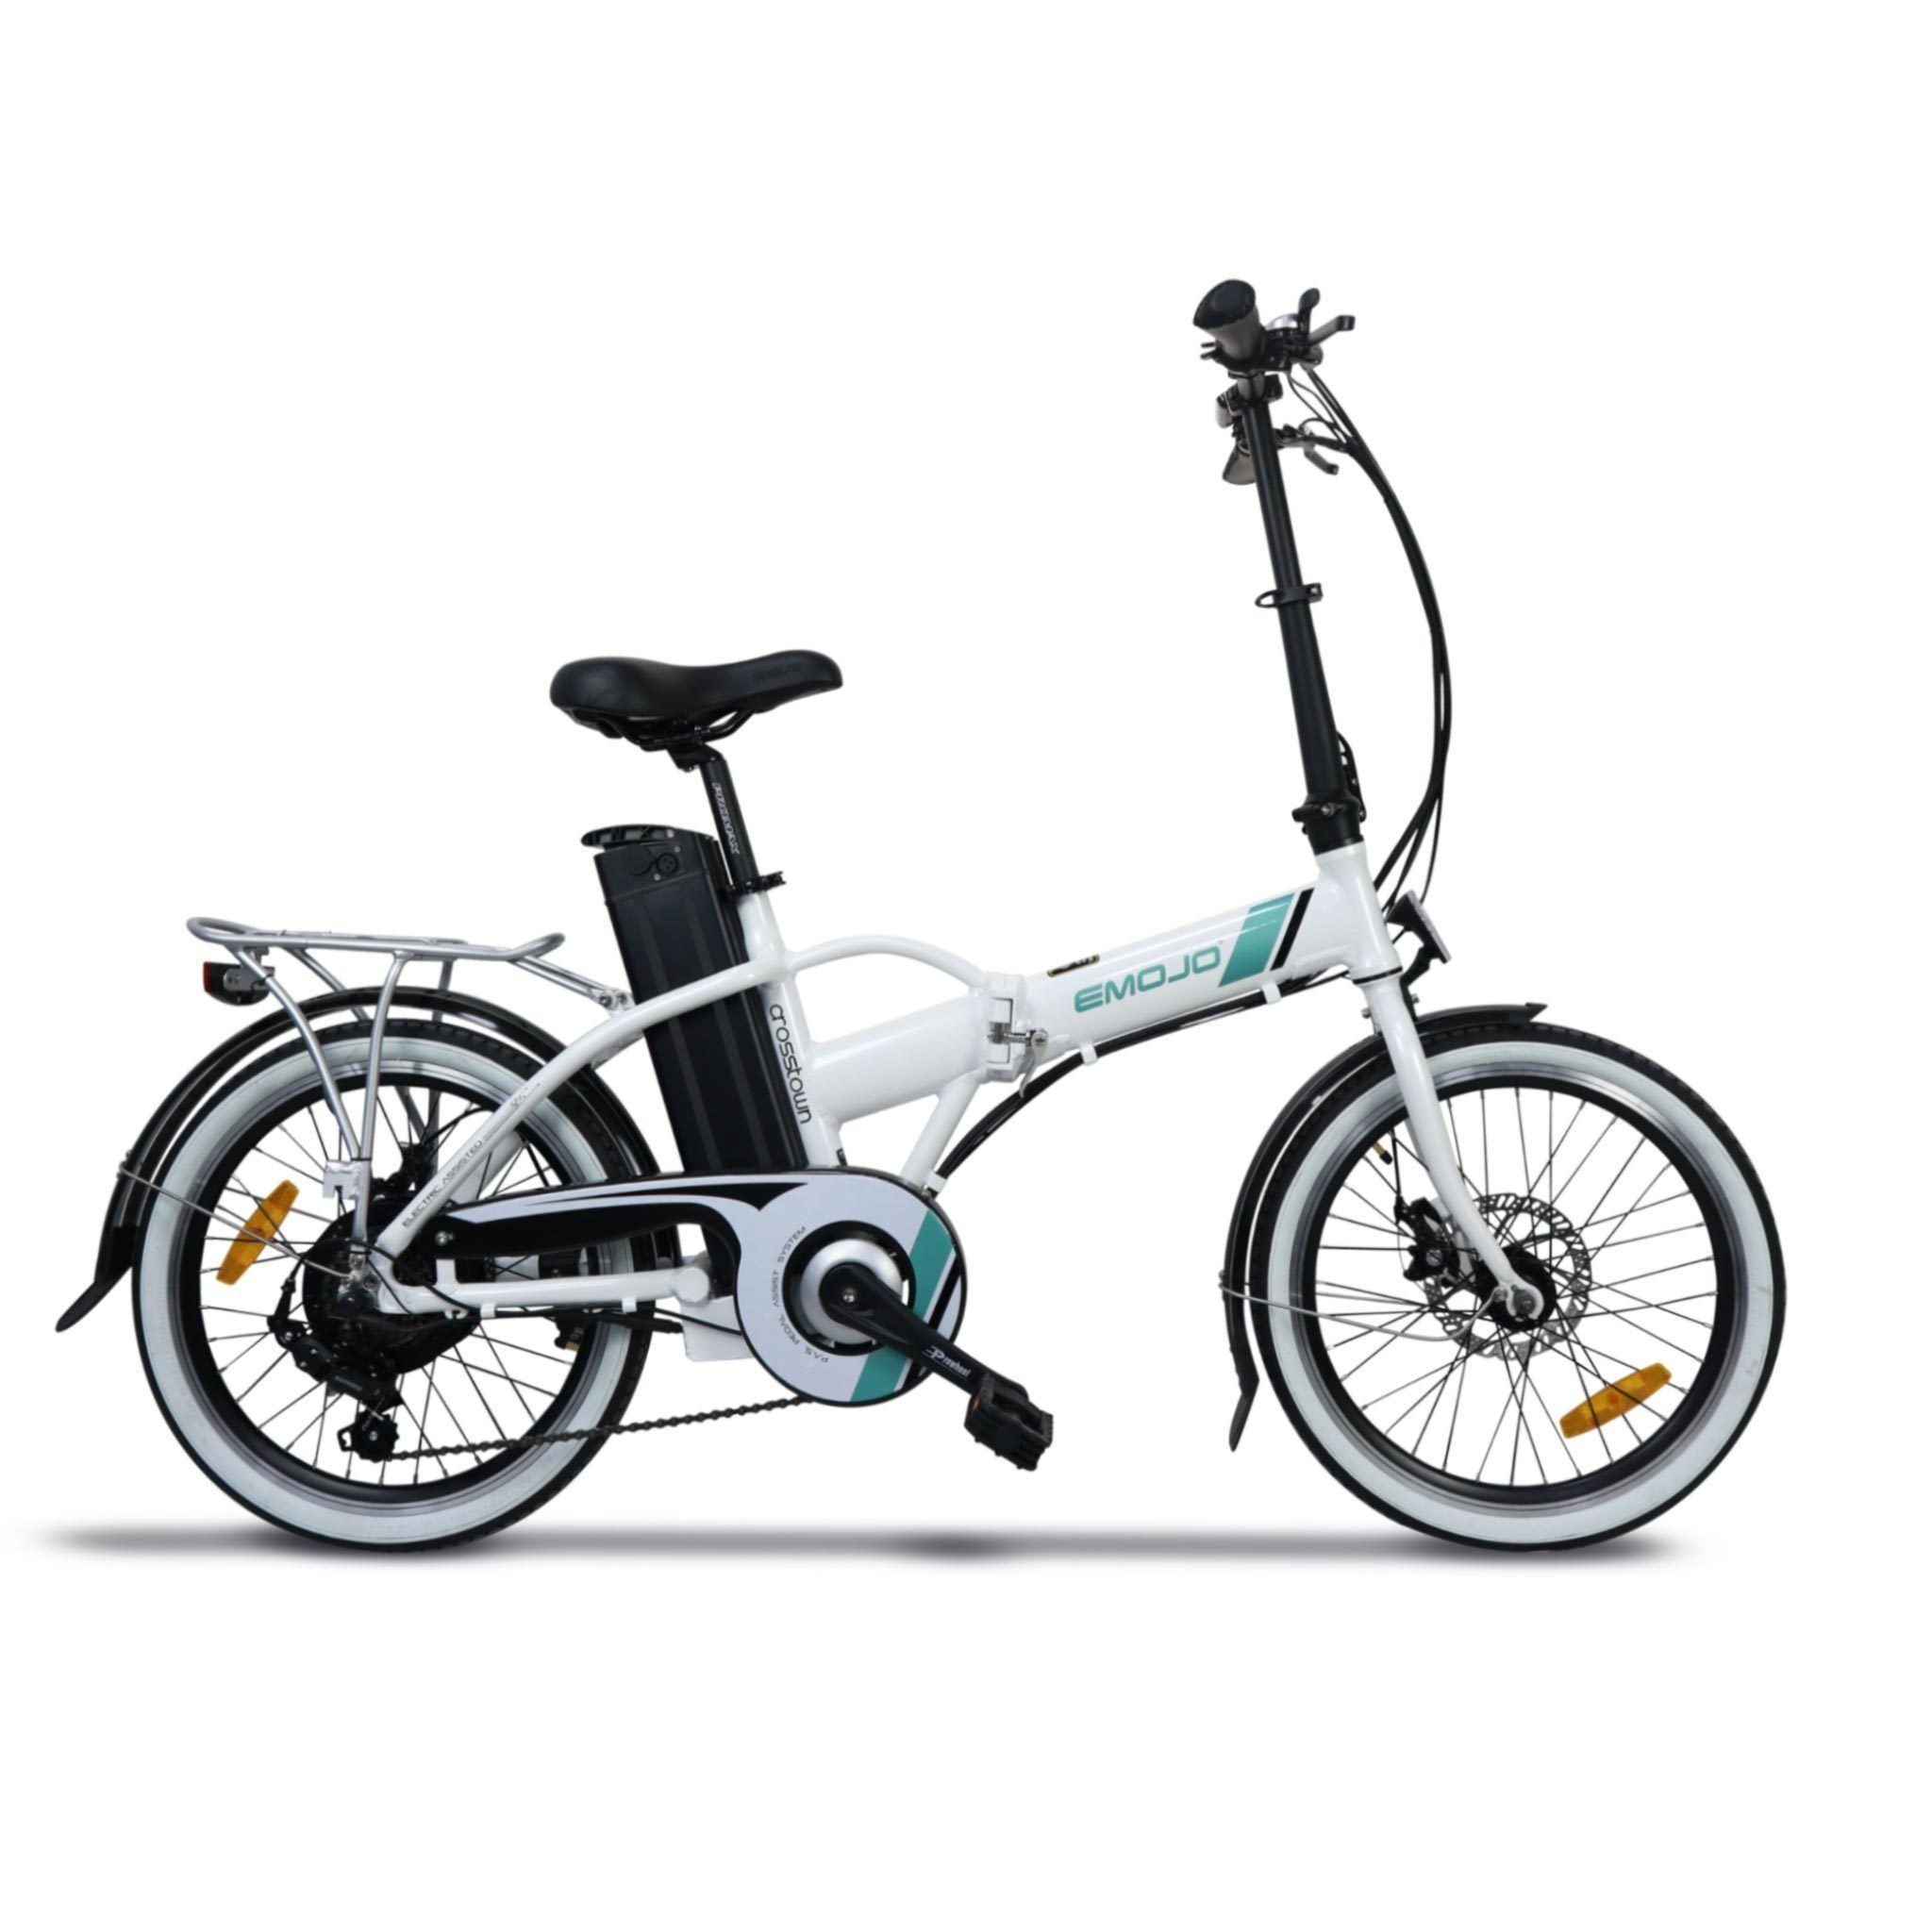 Emojo Crosstown 36v 350w 7 Speed Folding Electric Ebike